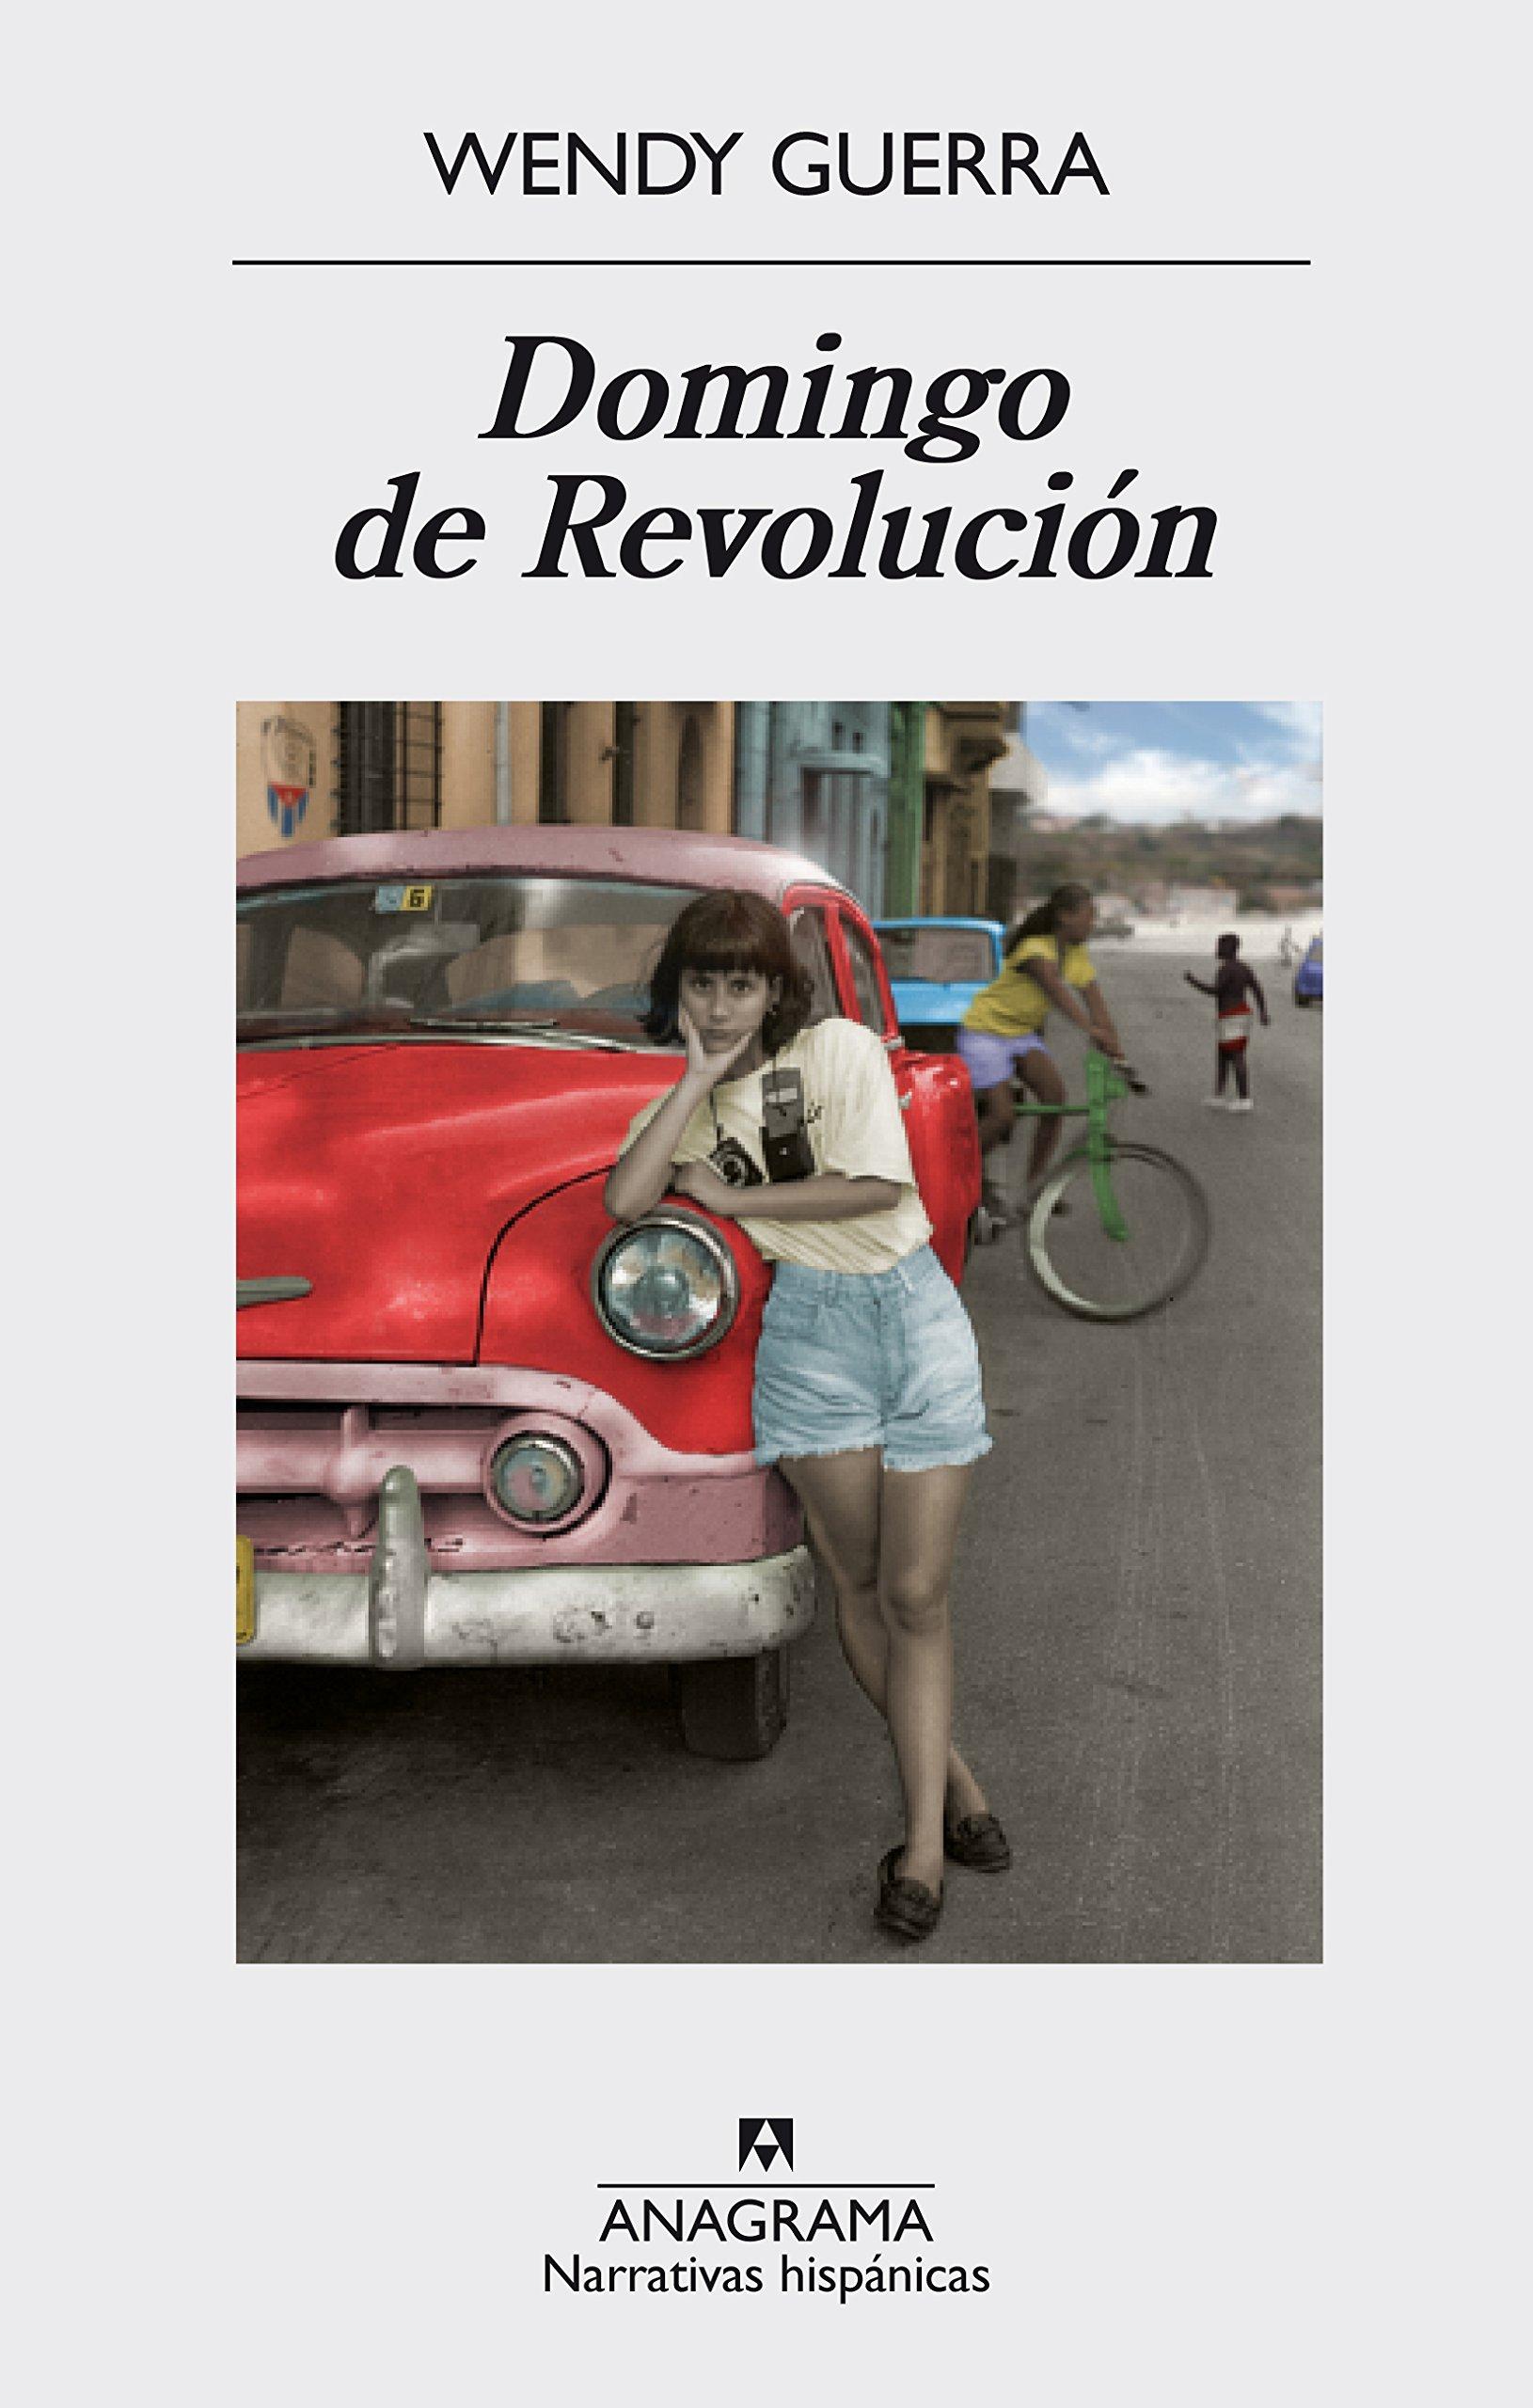 Domingo de Revolucion (Spanish Edition): Wendy Guerra: 9788433998101: Amazon.com: Books